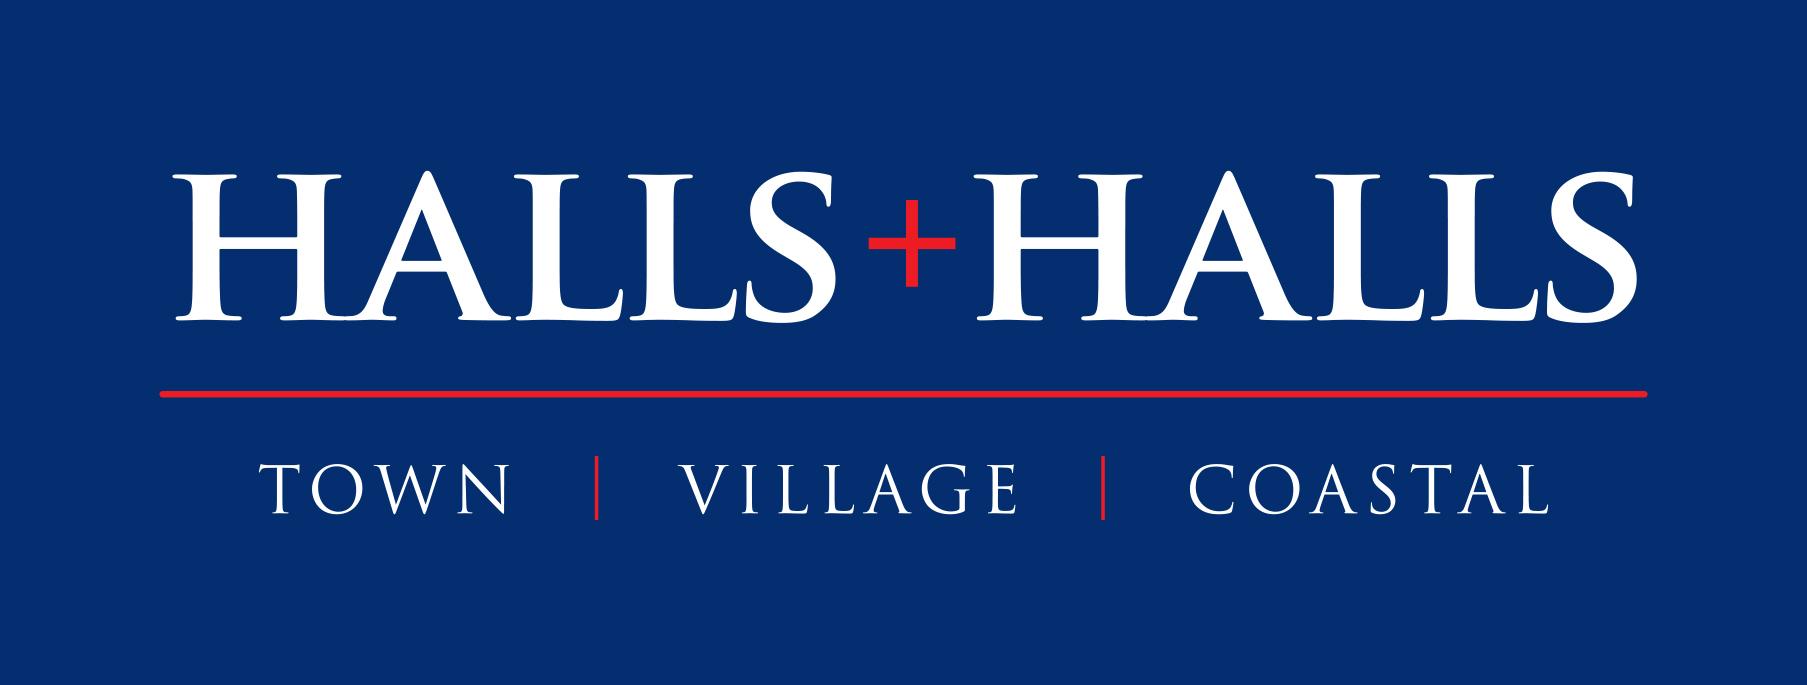 Halls & Halls